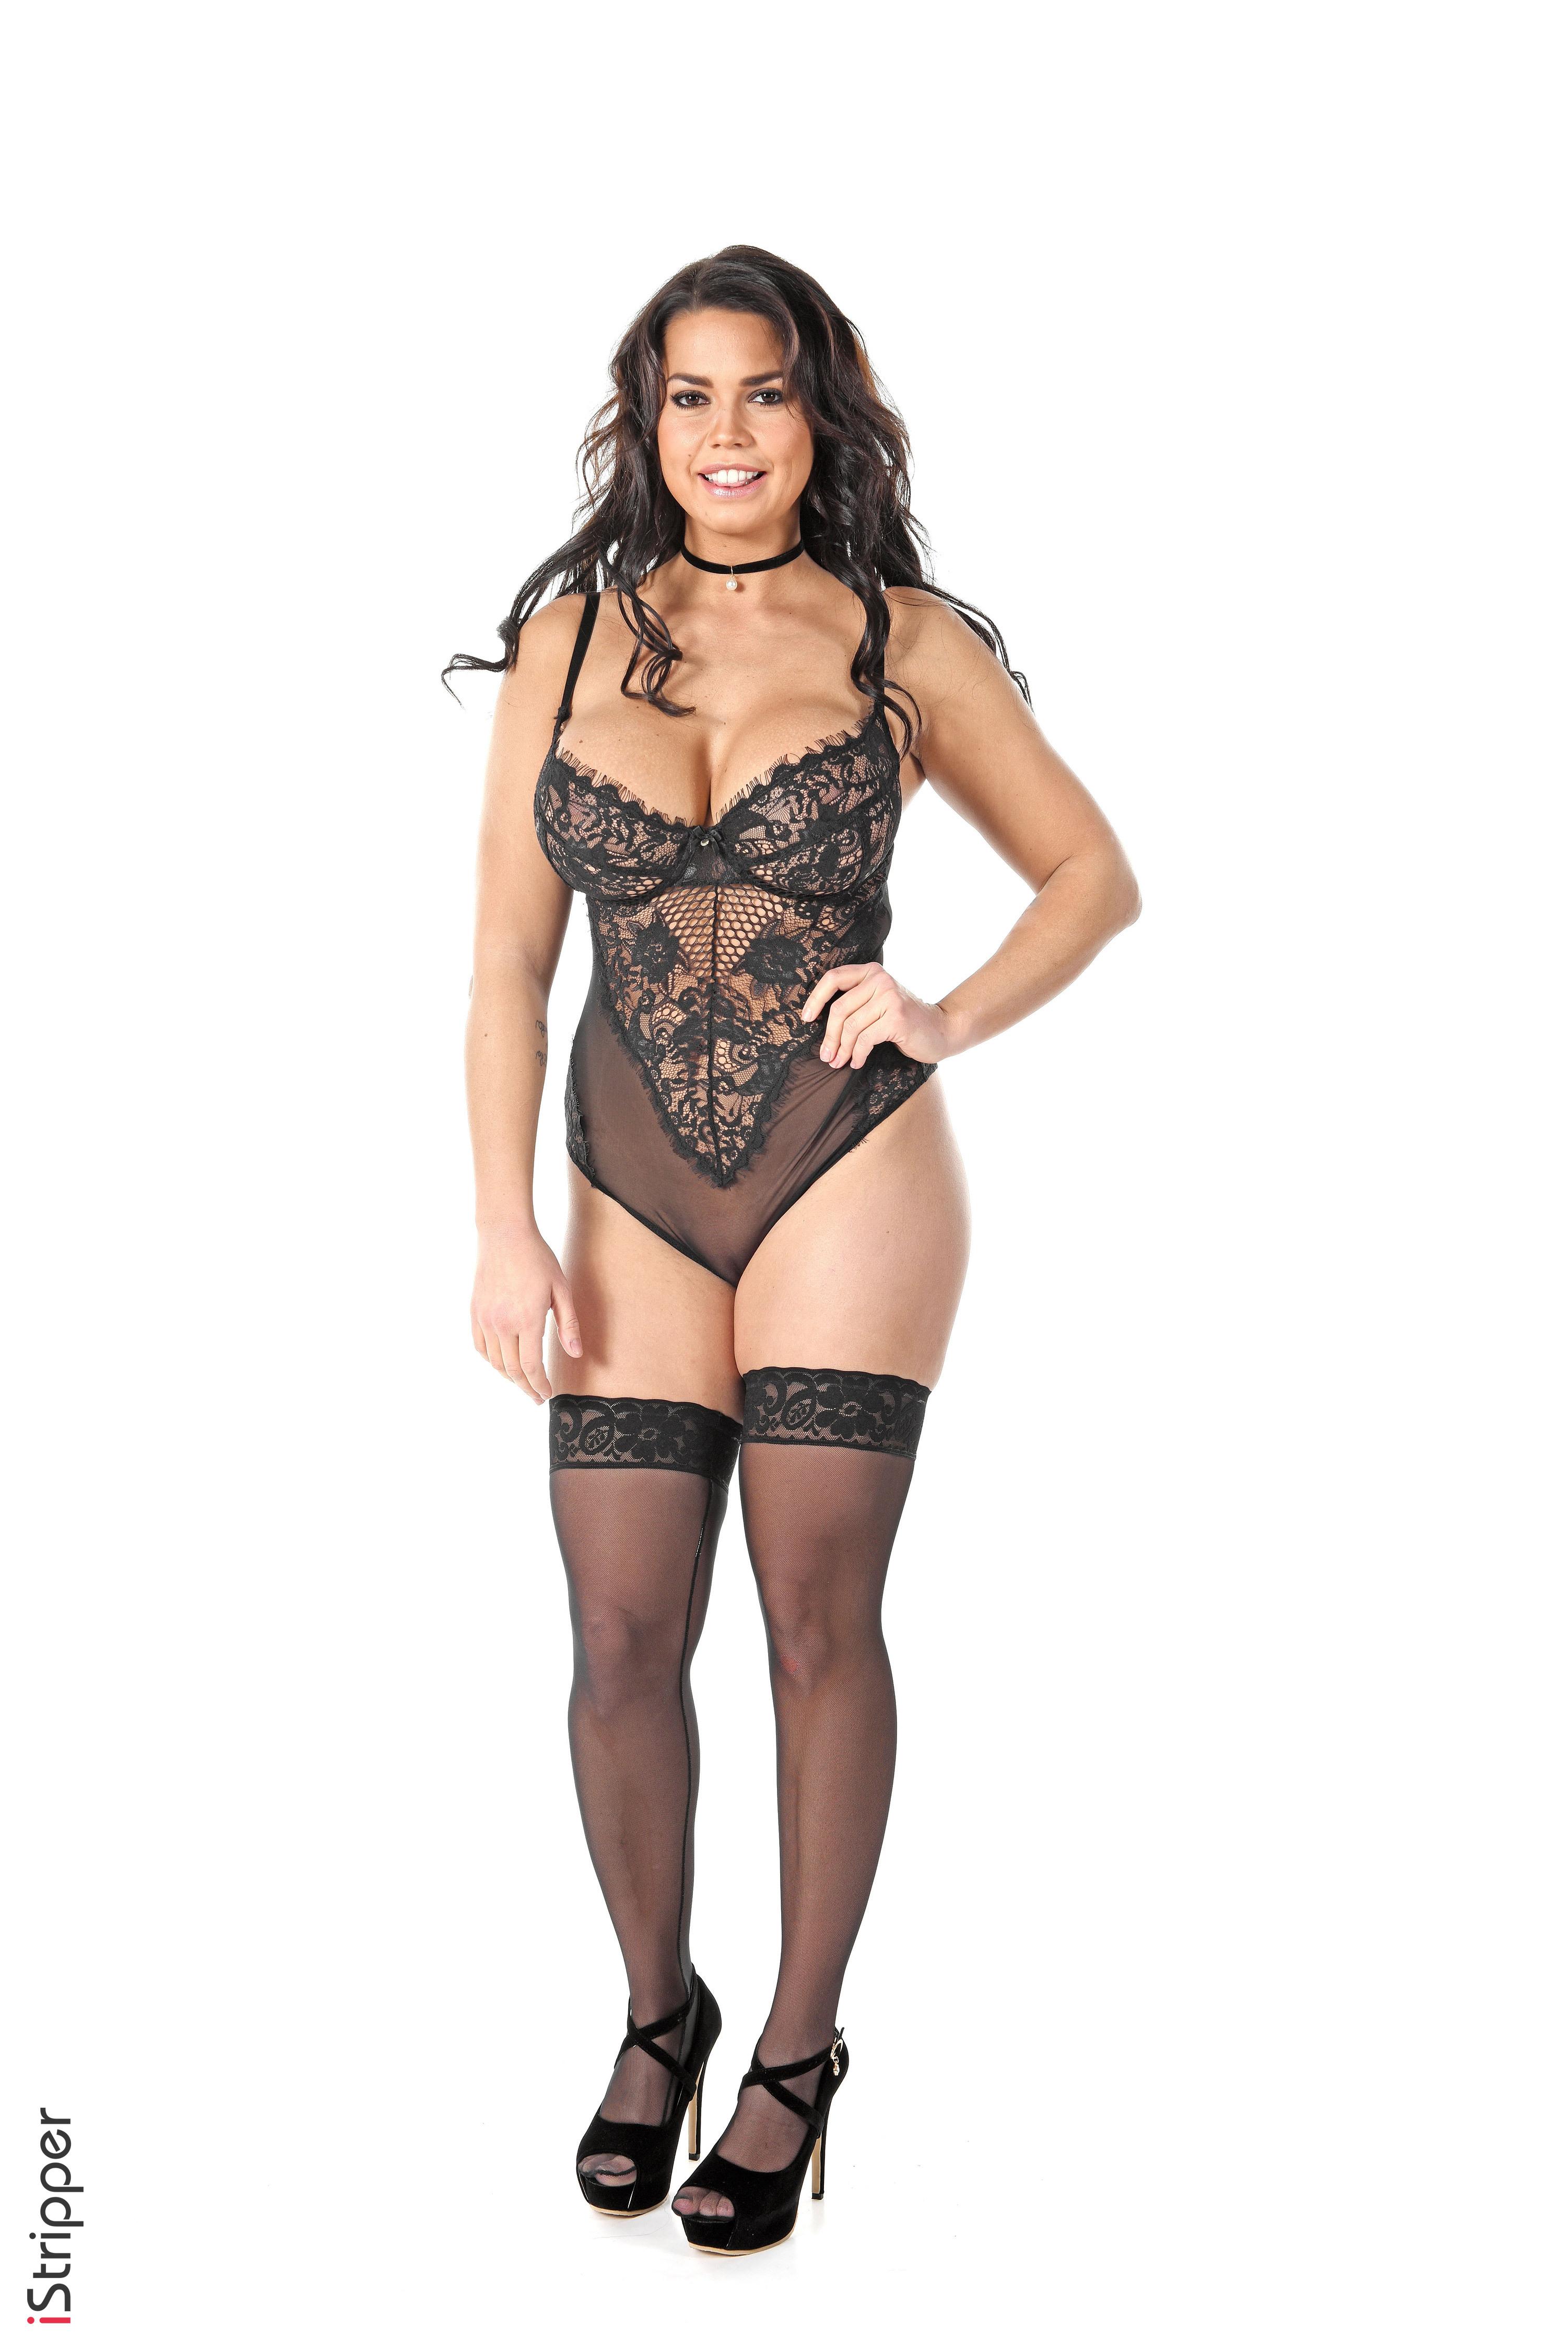 virtual stripper on desktop